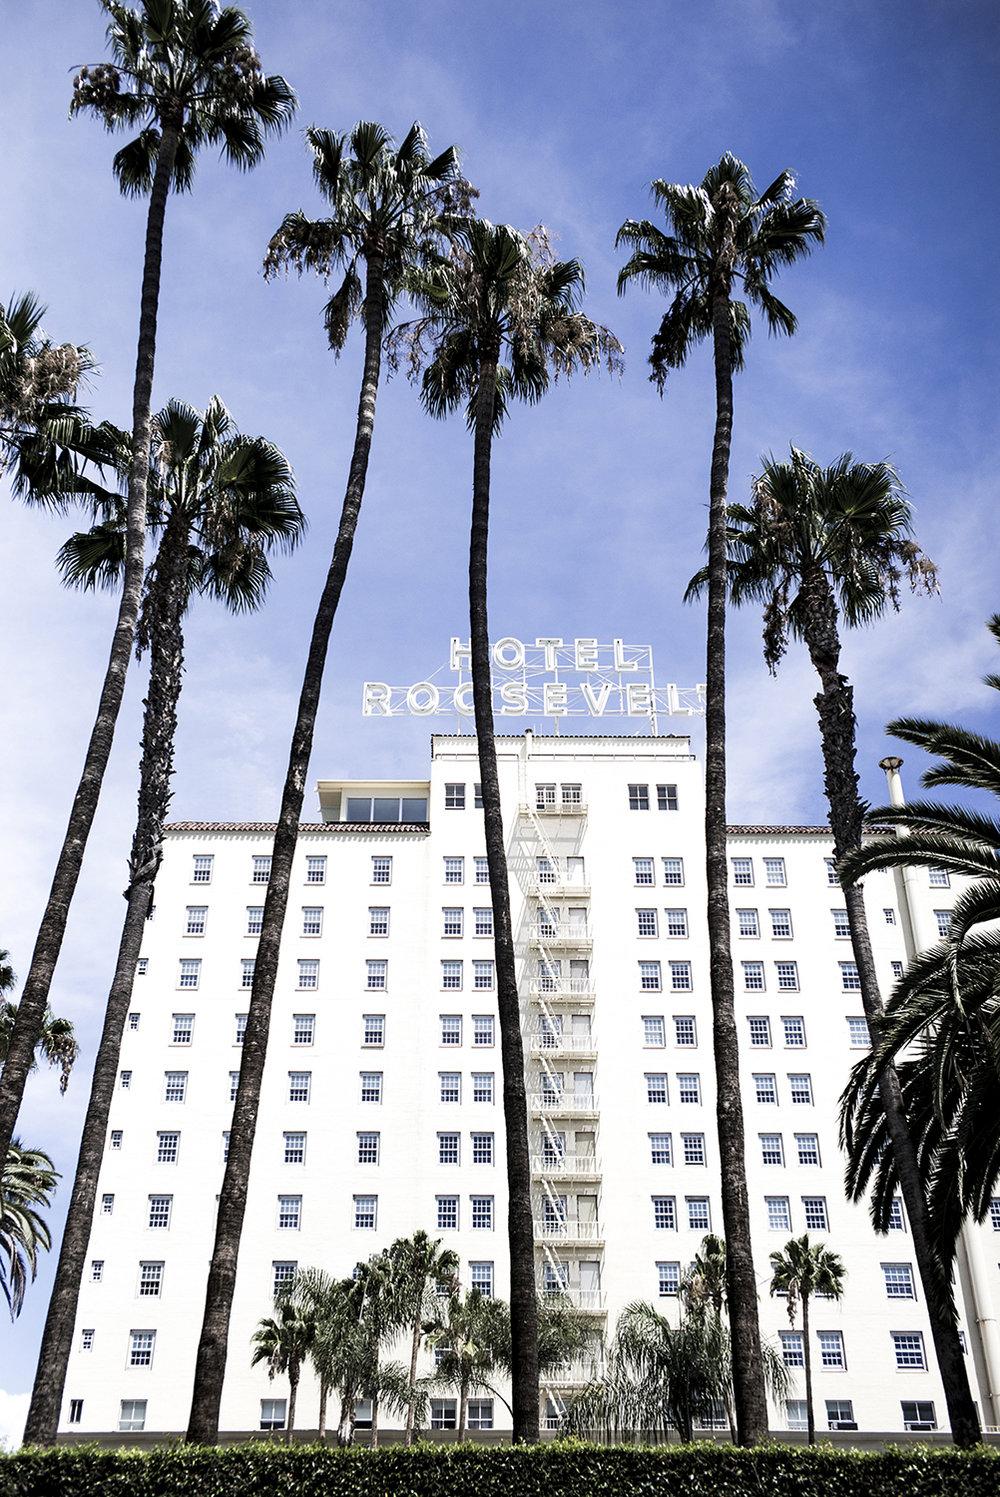 Hollywood Roosevelt Hotel  Hollywood Roosevelt Hotel  Los Angeles, CA